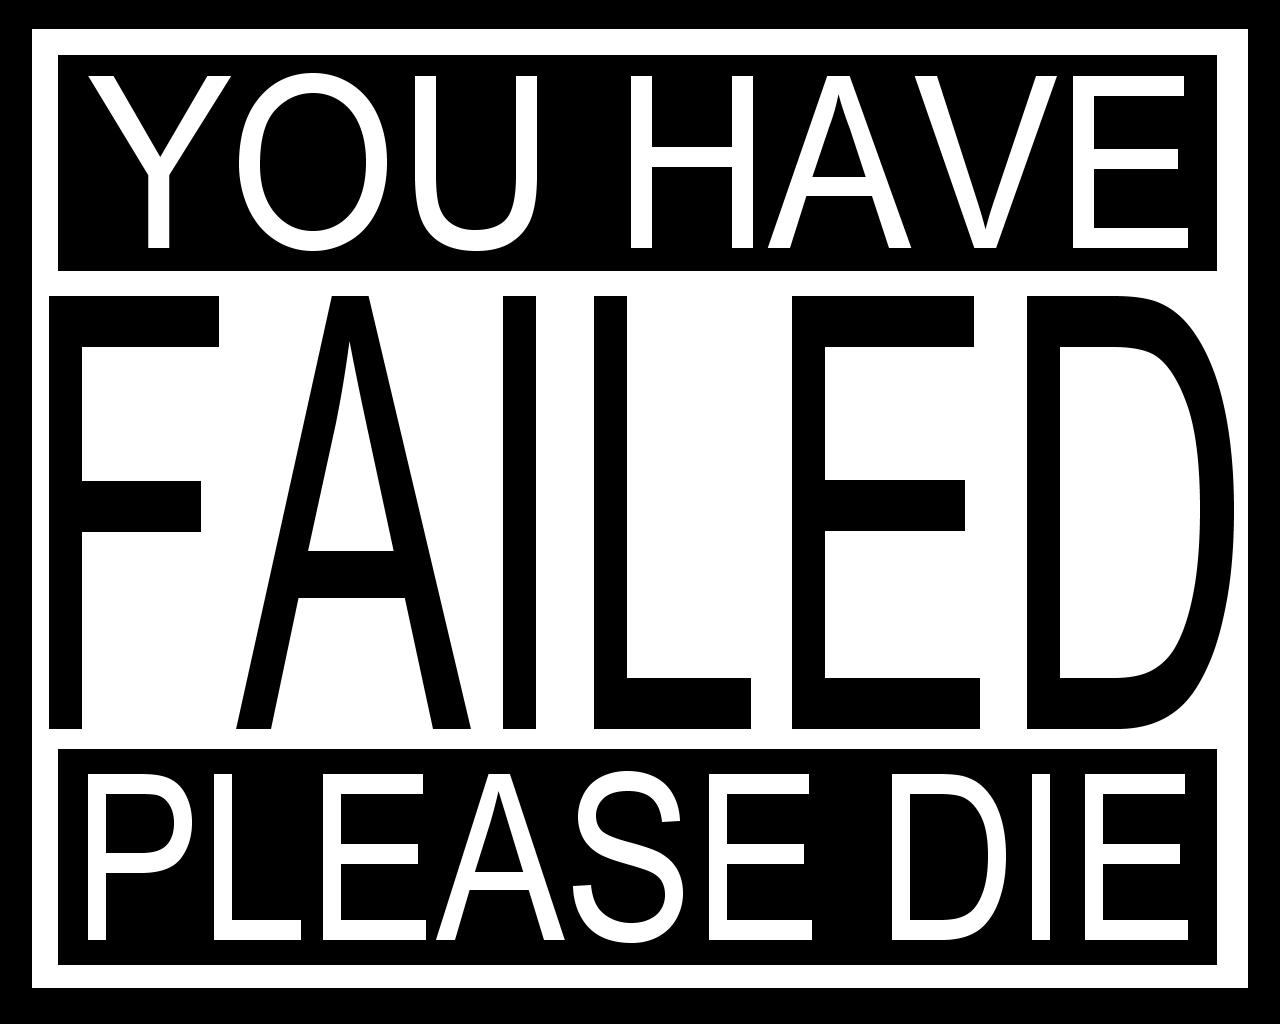 FAIL by Trudetski